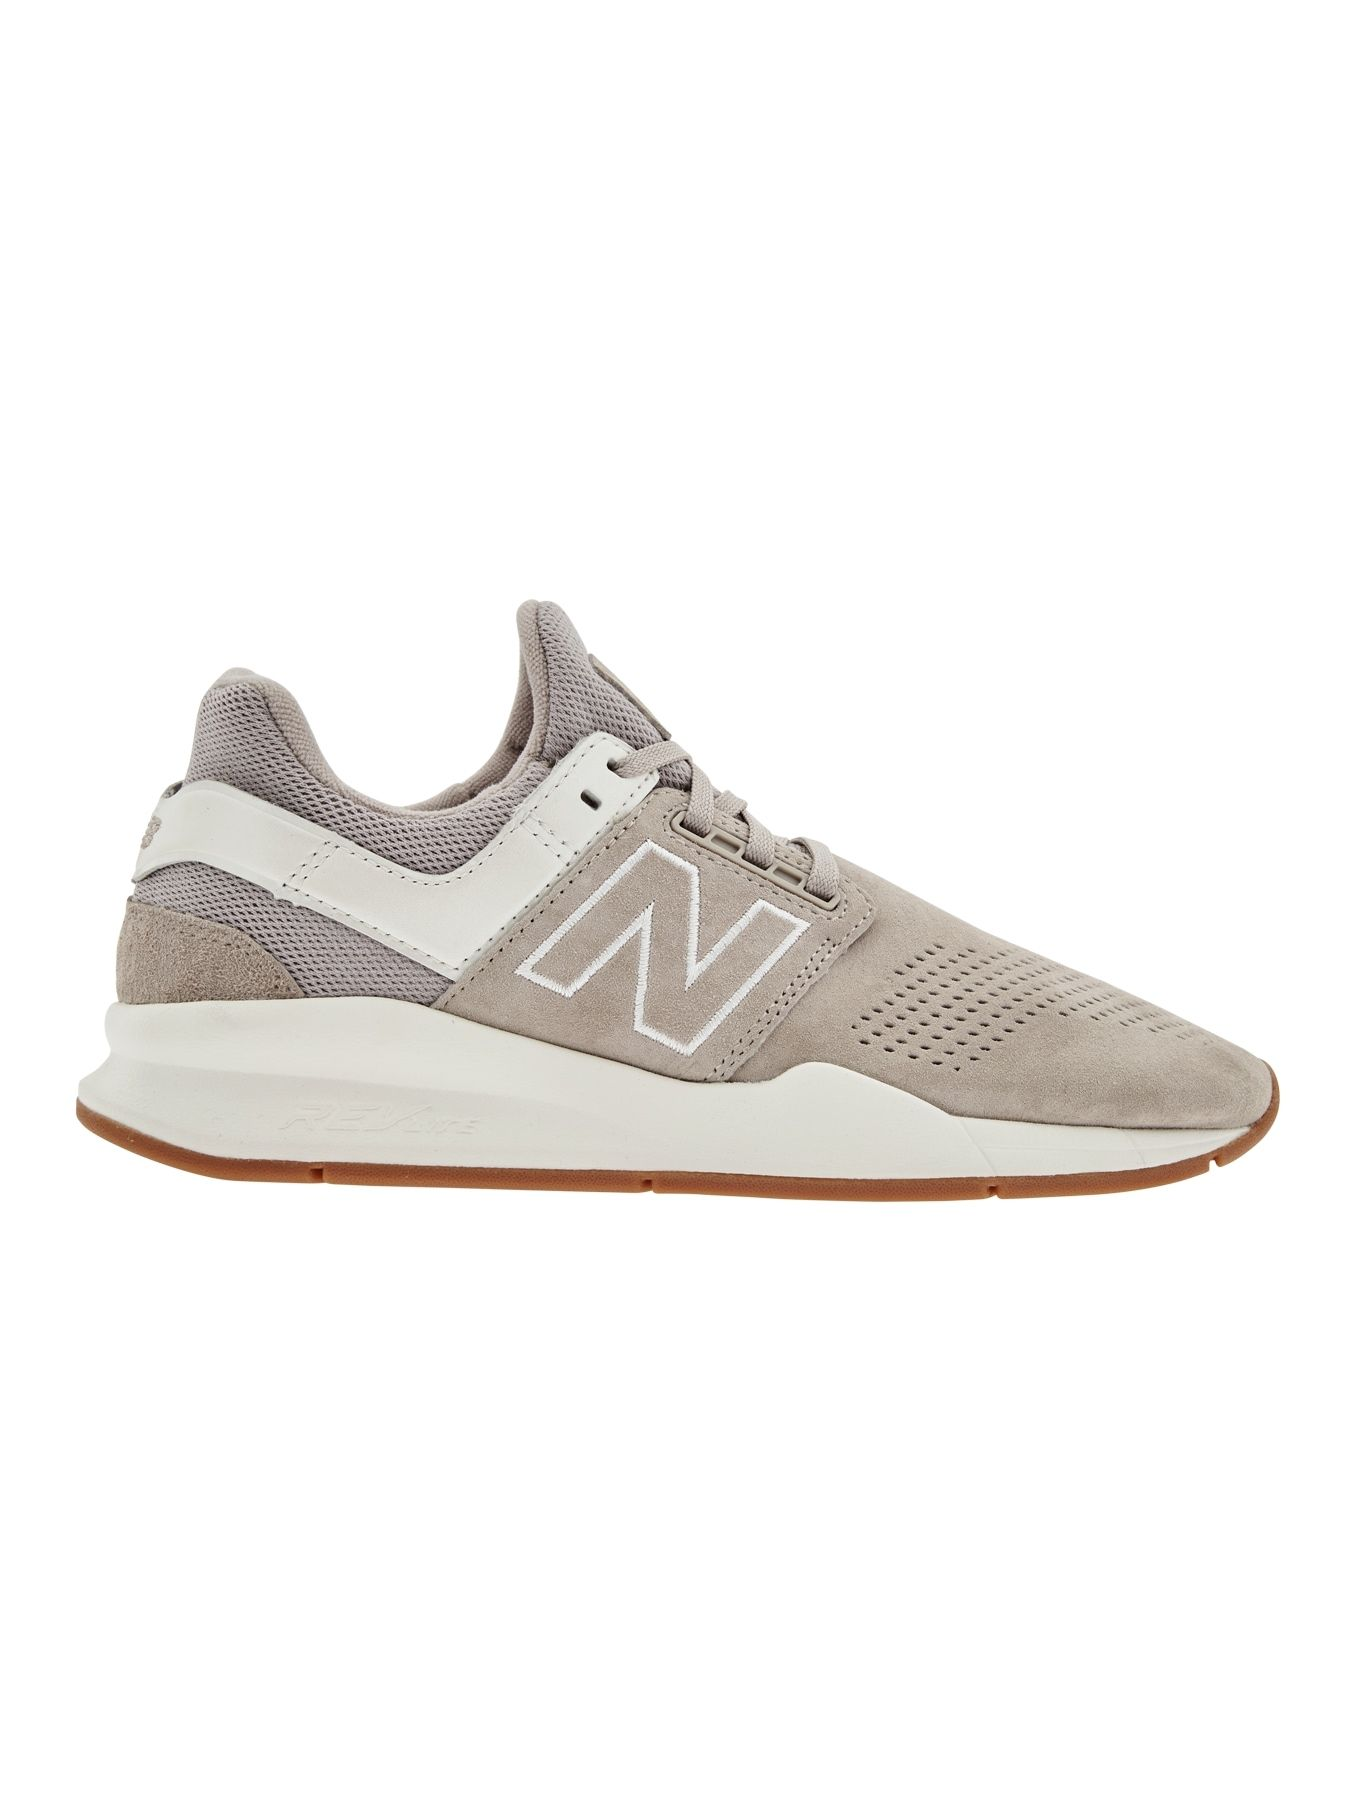 Nubuck 247 Sneaker by New Balance